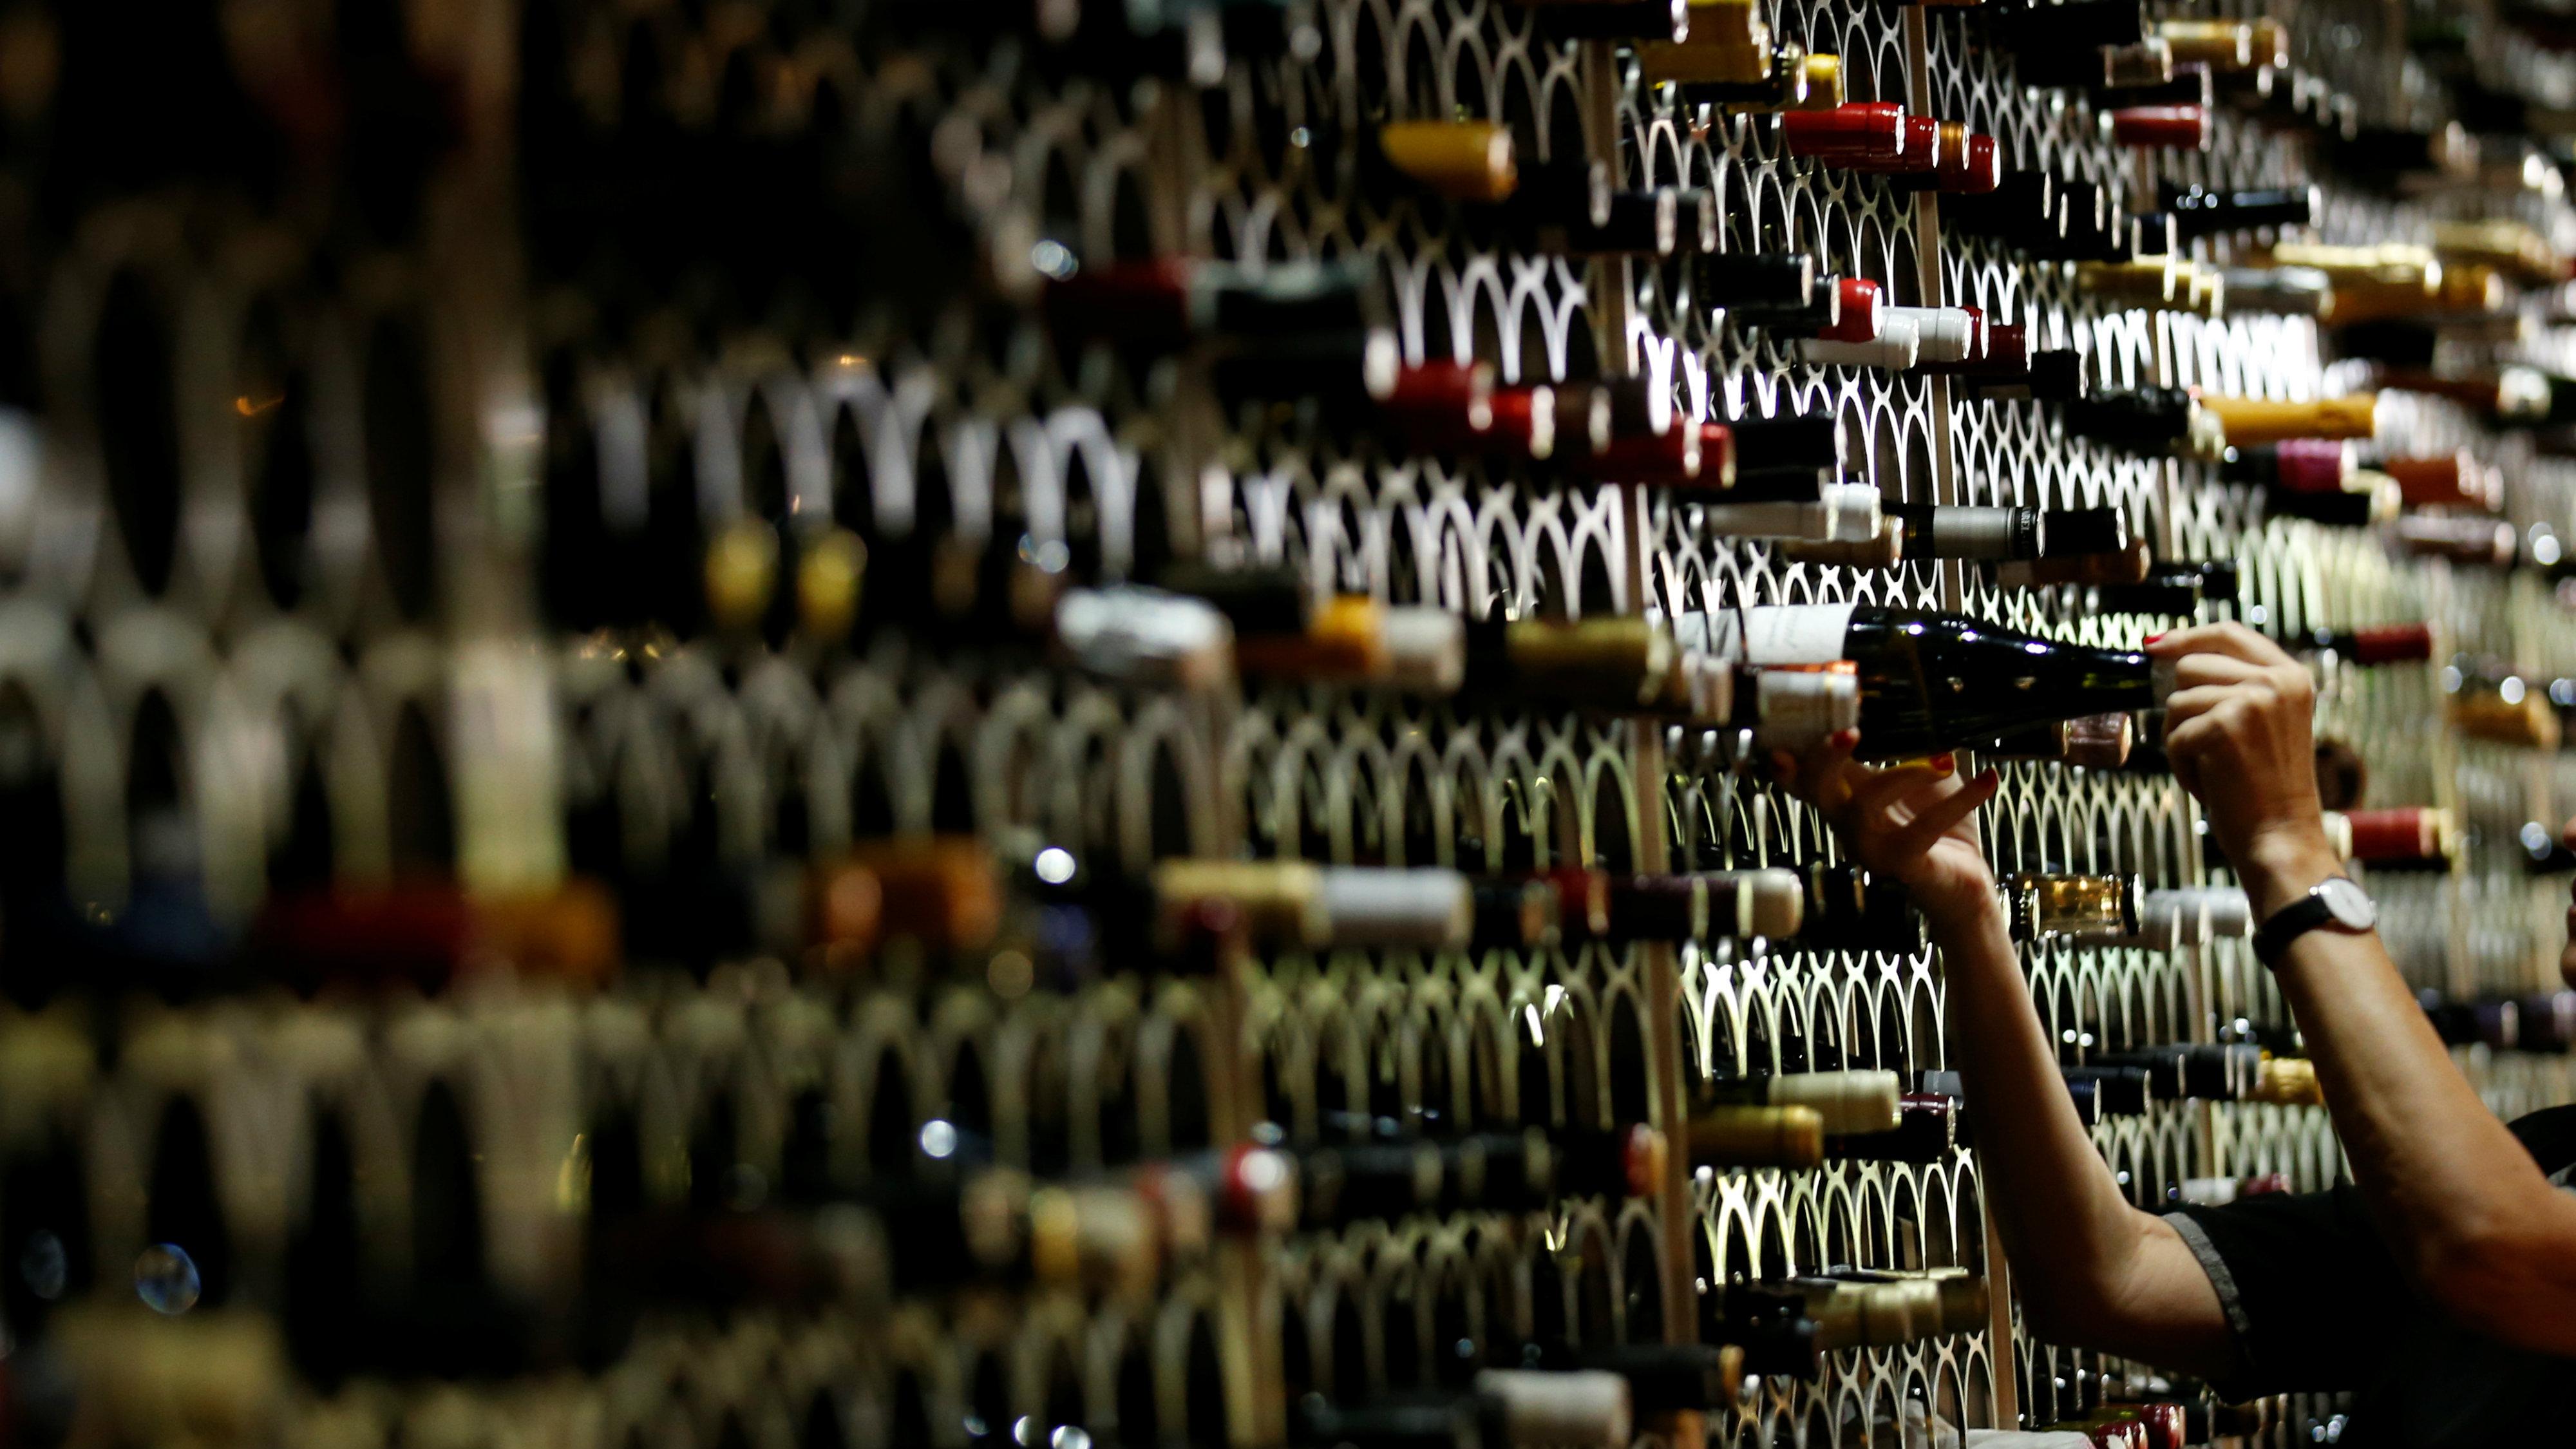 The Uk Is Stockpiling Wine Ahead Of Brexit Quartz